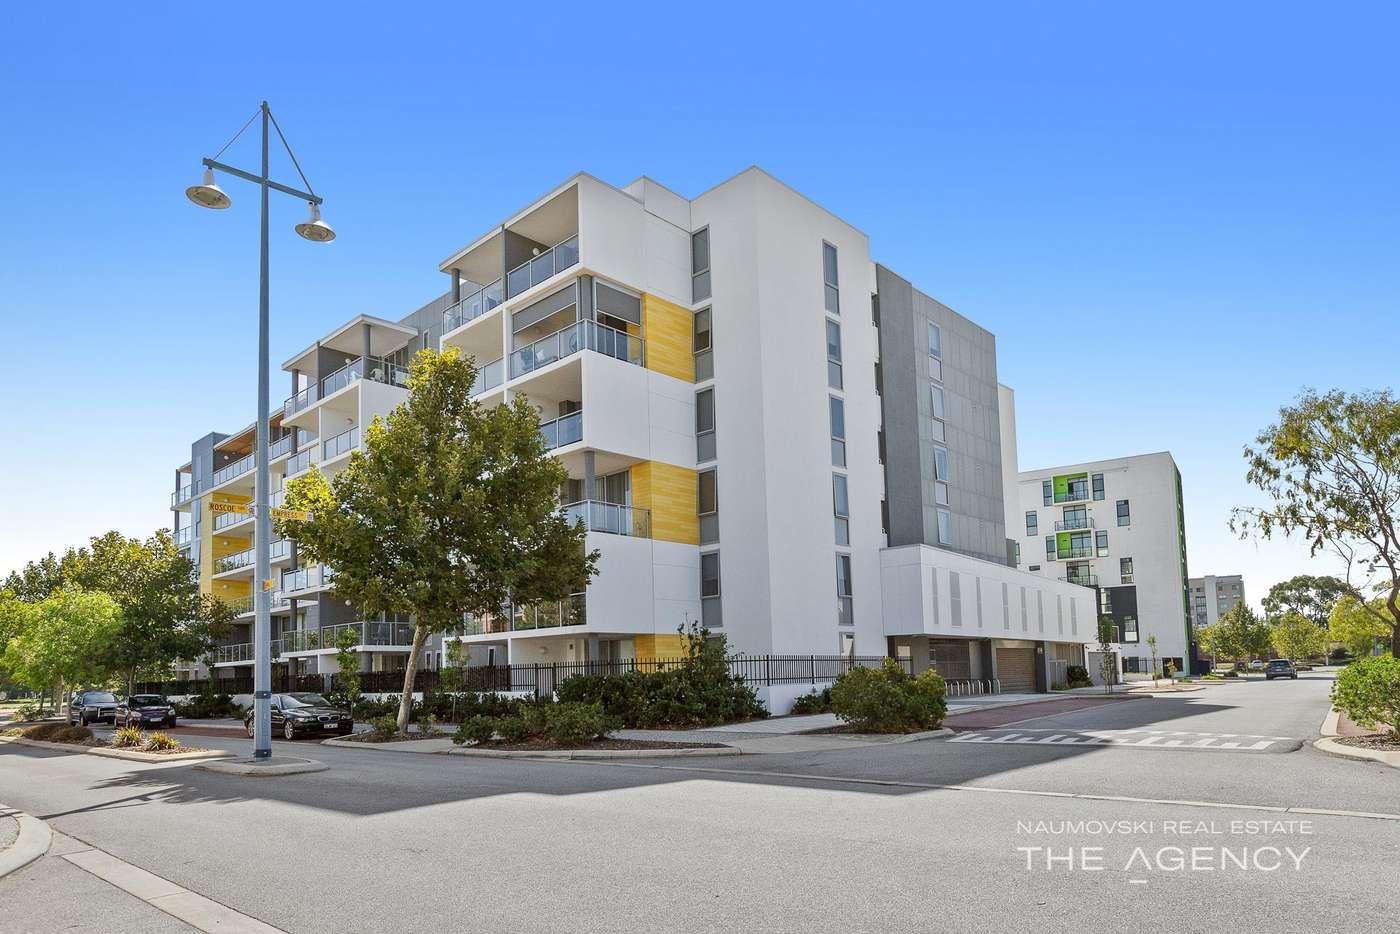 Main view of Homely apartment listing, 44 /24 Flinders Lane, Rockingham WA 6168